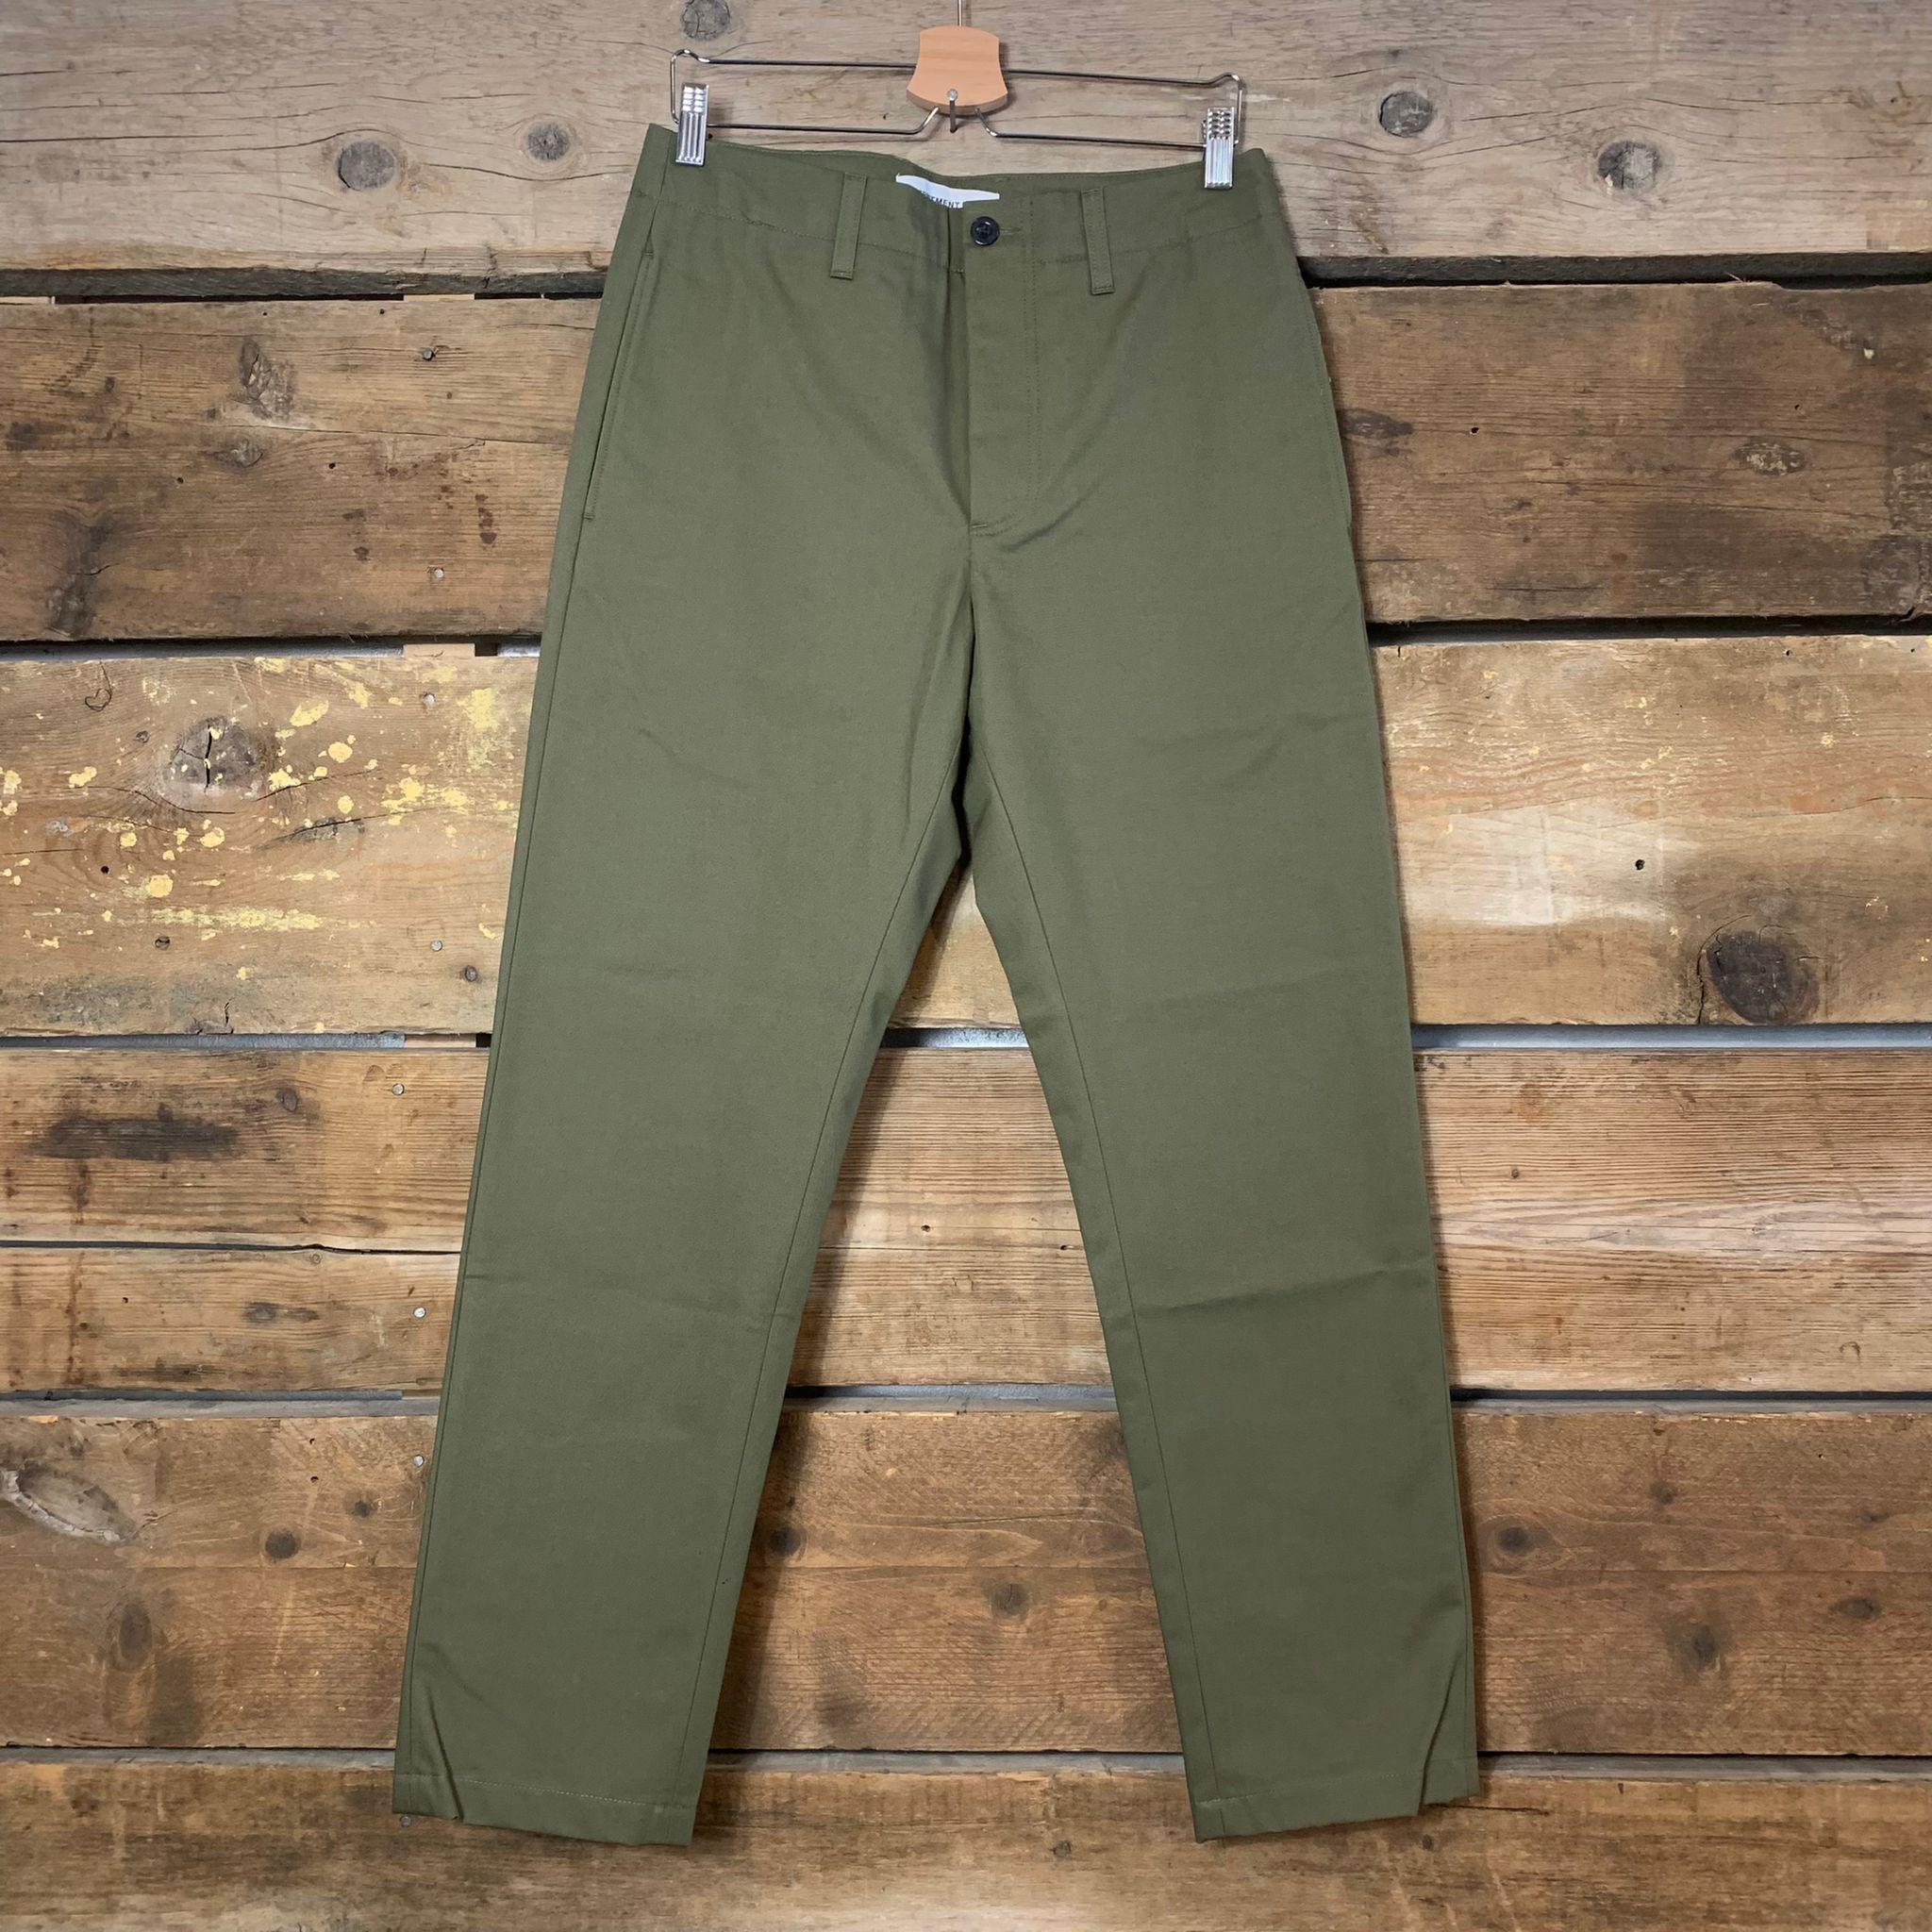 Pantalone Department 5 Off Verde Militare